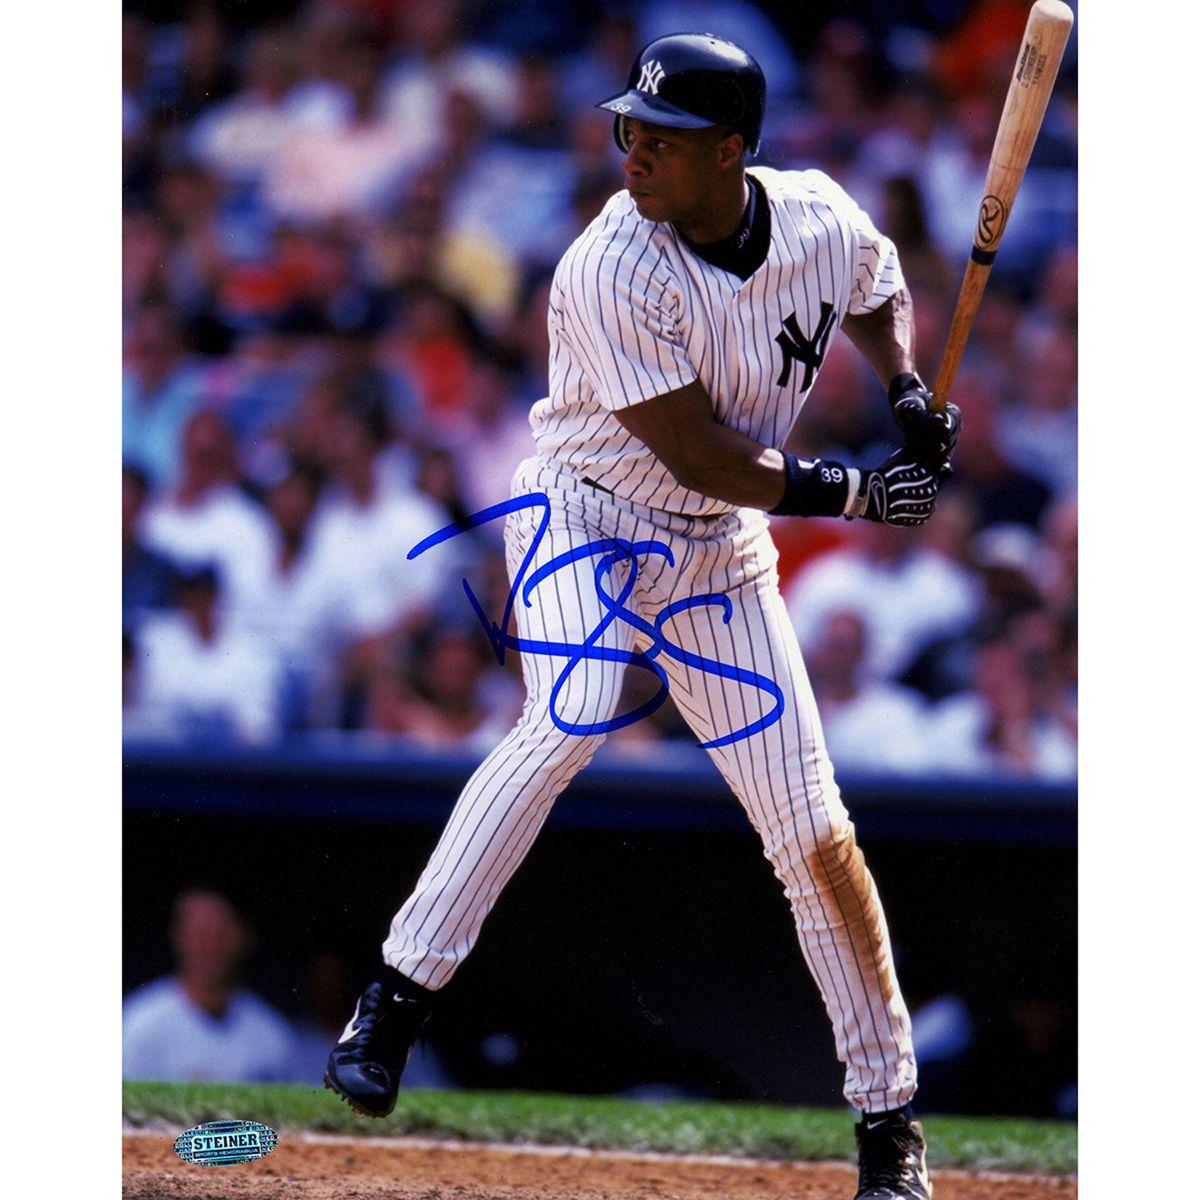 Darryl Strawberry Ny Yankees Pinstripes Batting 8x10 Photograph Baseball Photos Ny Yankees Darryl Strawberry